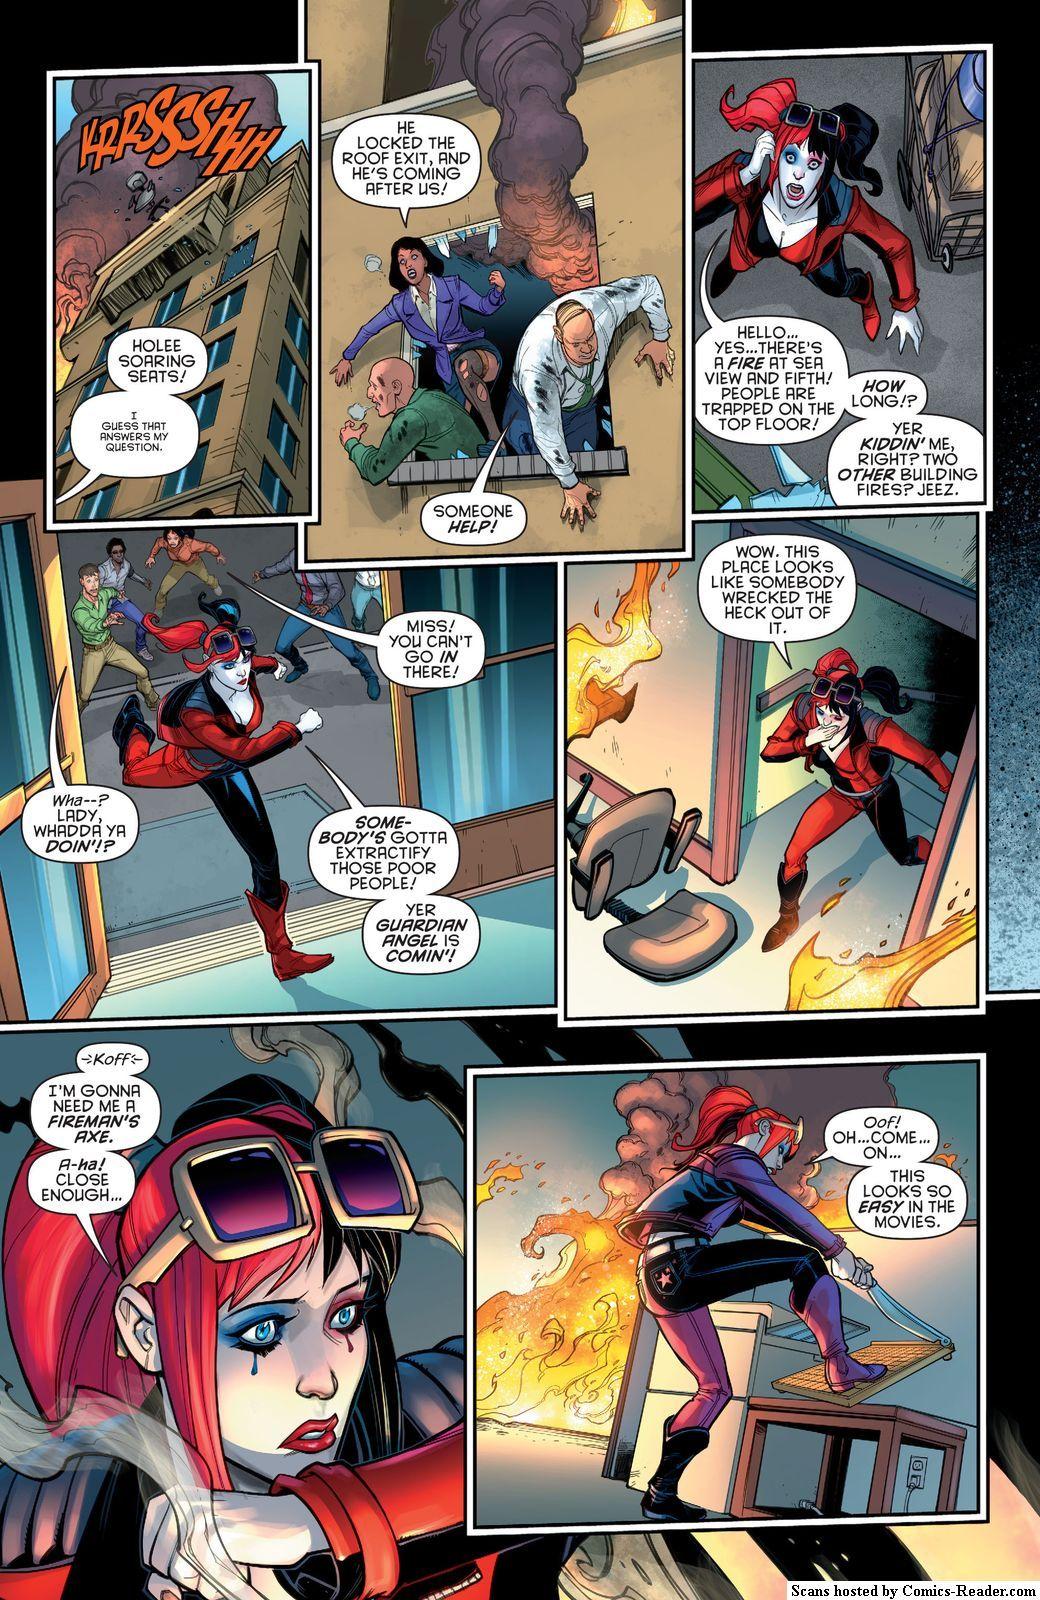 Pin by Telesia Manuleleua on Comic Book | Harley quinn